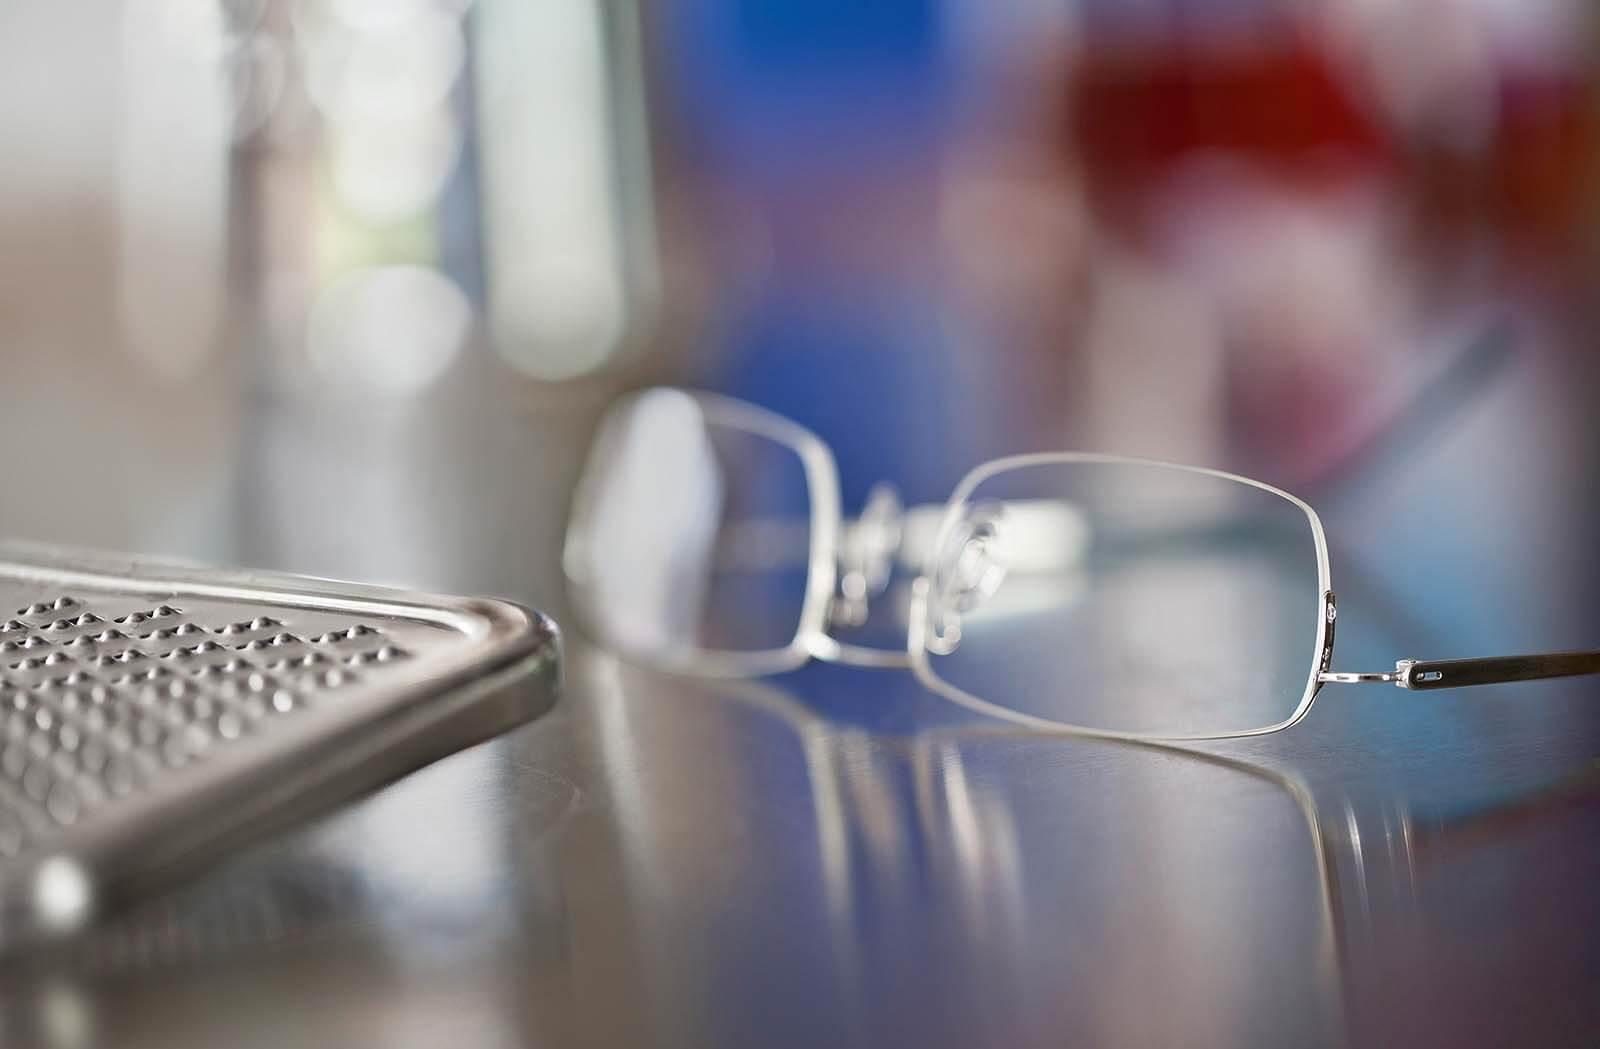 Praktičnost progresivnih očal